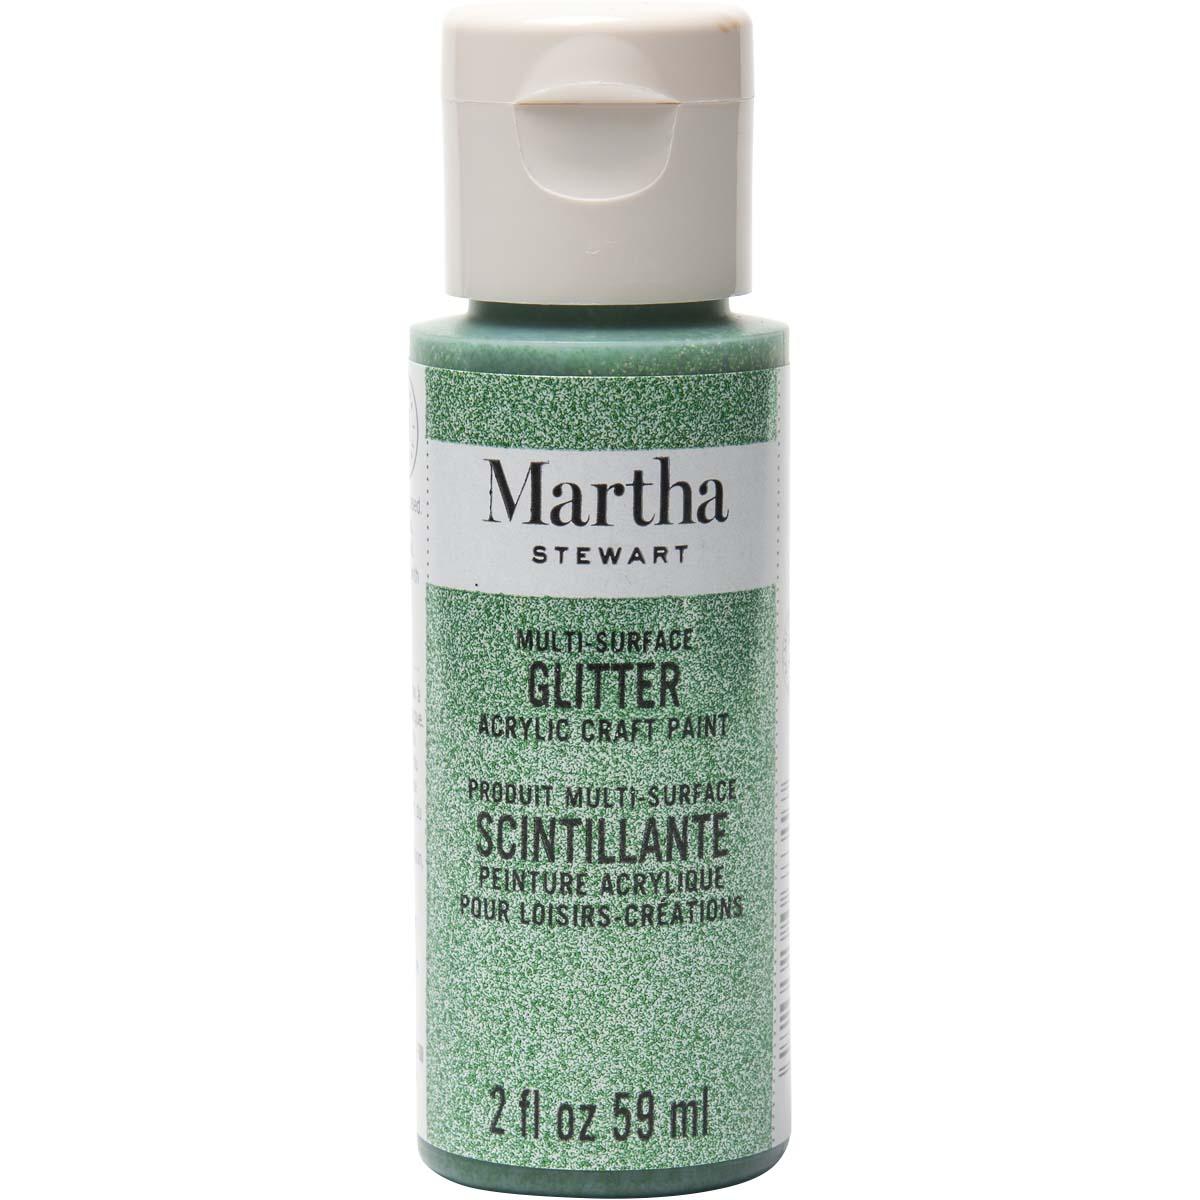 Martha Stewart ® Multi-Surface Glitter Acrylic Craft Paint - Verdelite, 2 oz. - 32159CA